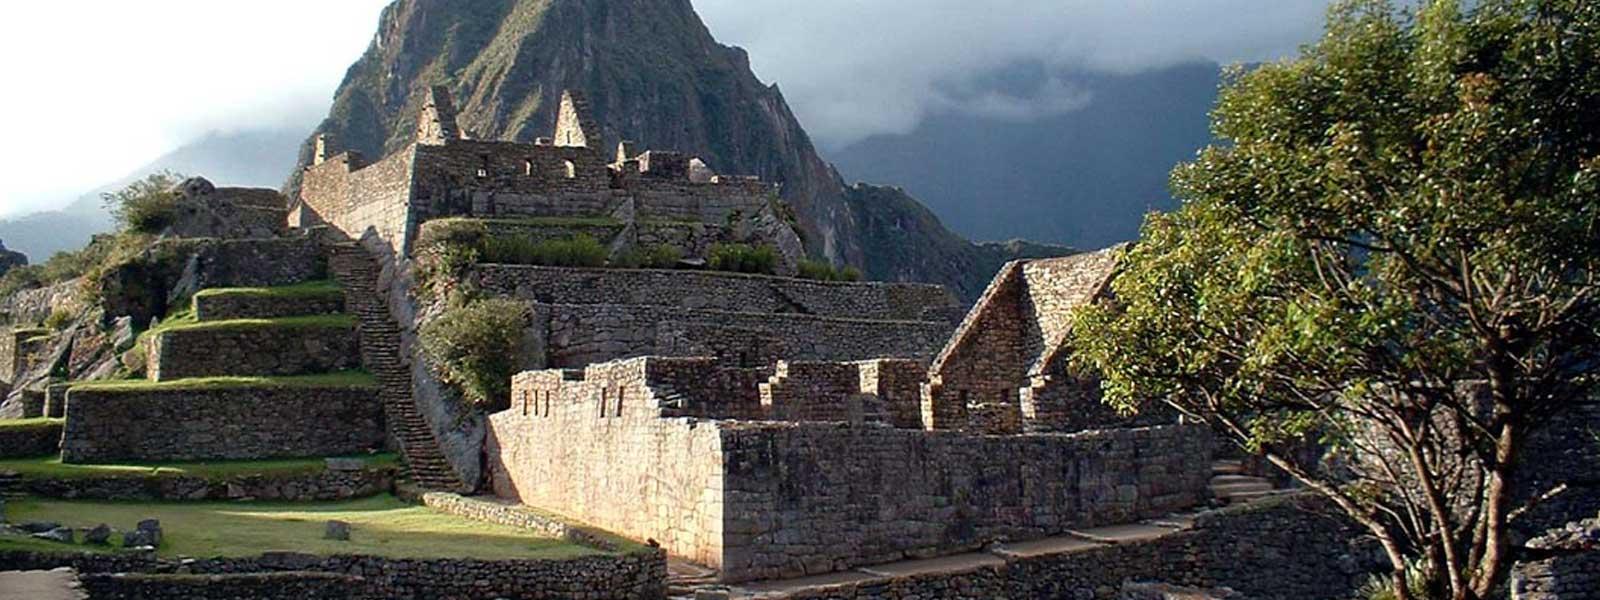 Travel Advice to Machu Picchu